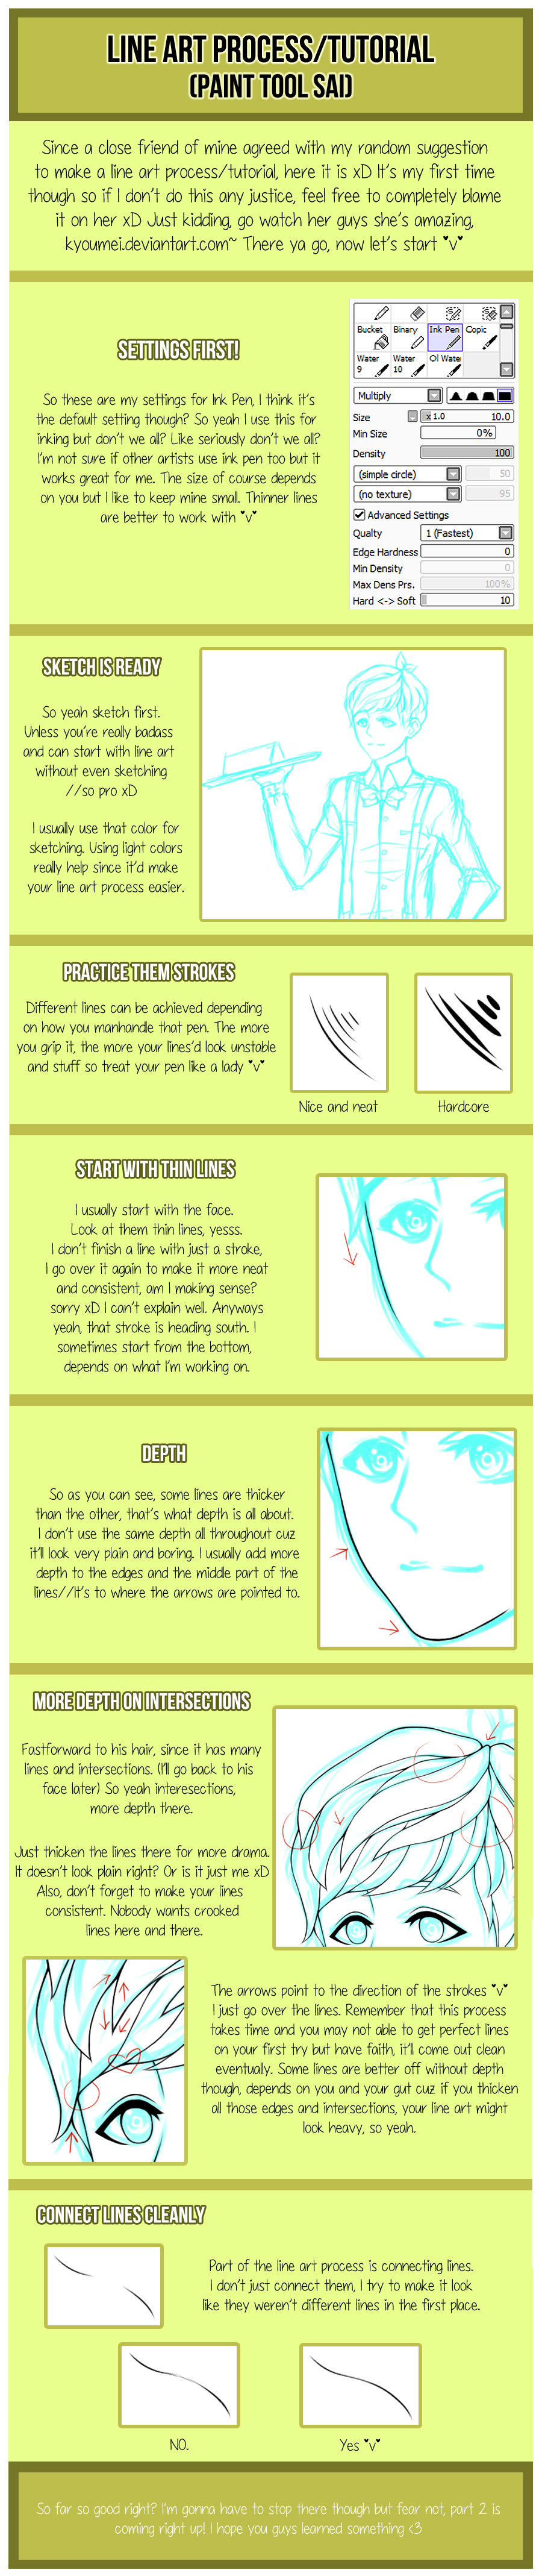 Line art process/tutorial (part 1) by misunderstoodpotato